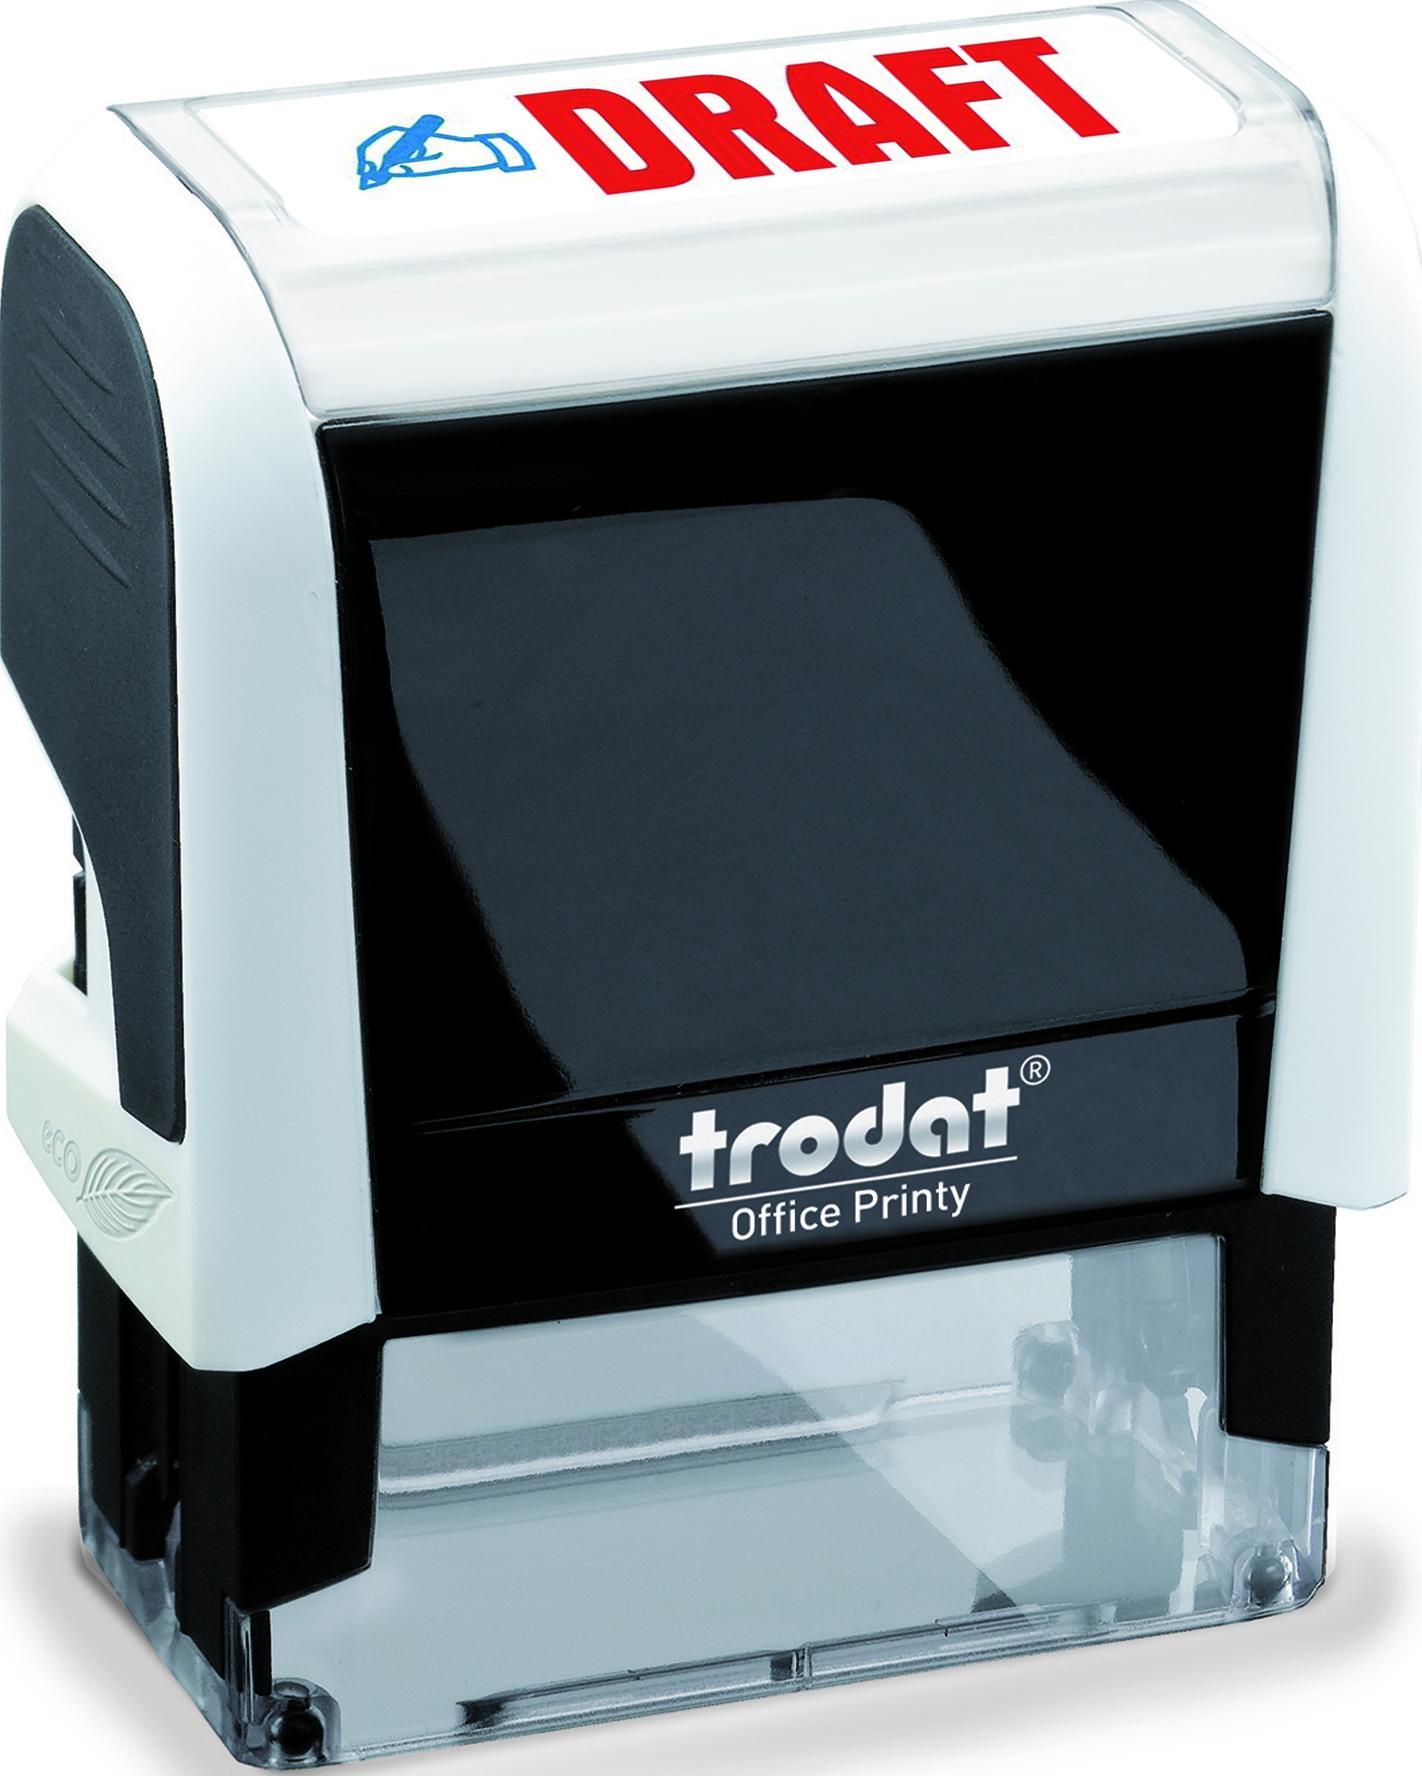 Trodat Office Printy 4912 White DRAFT